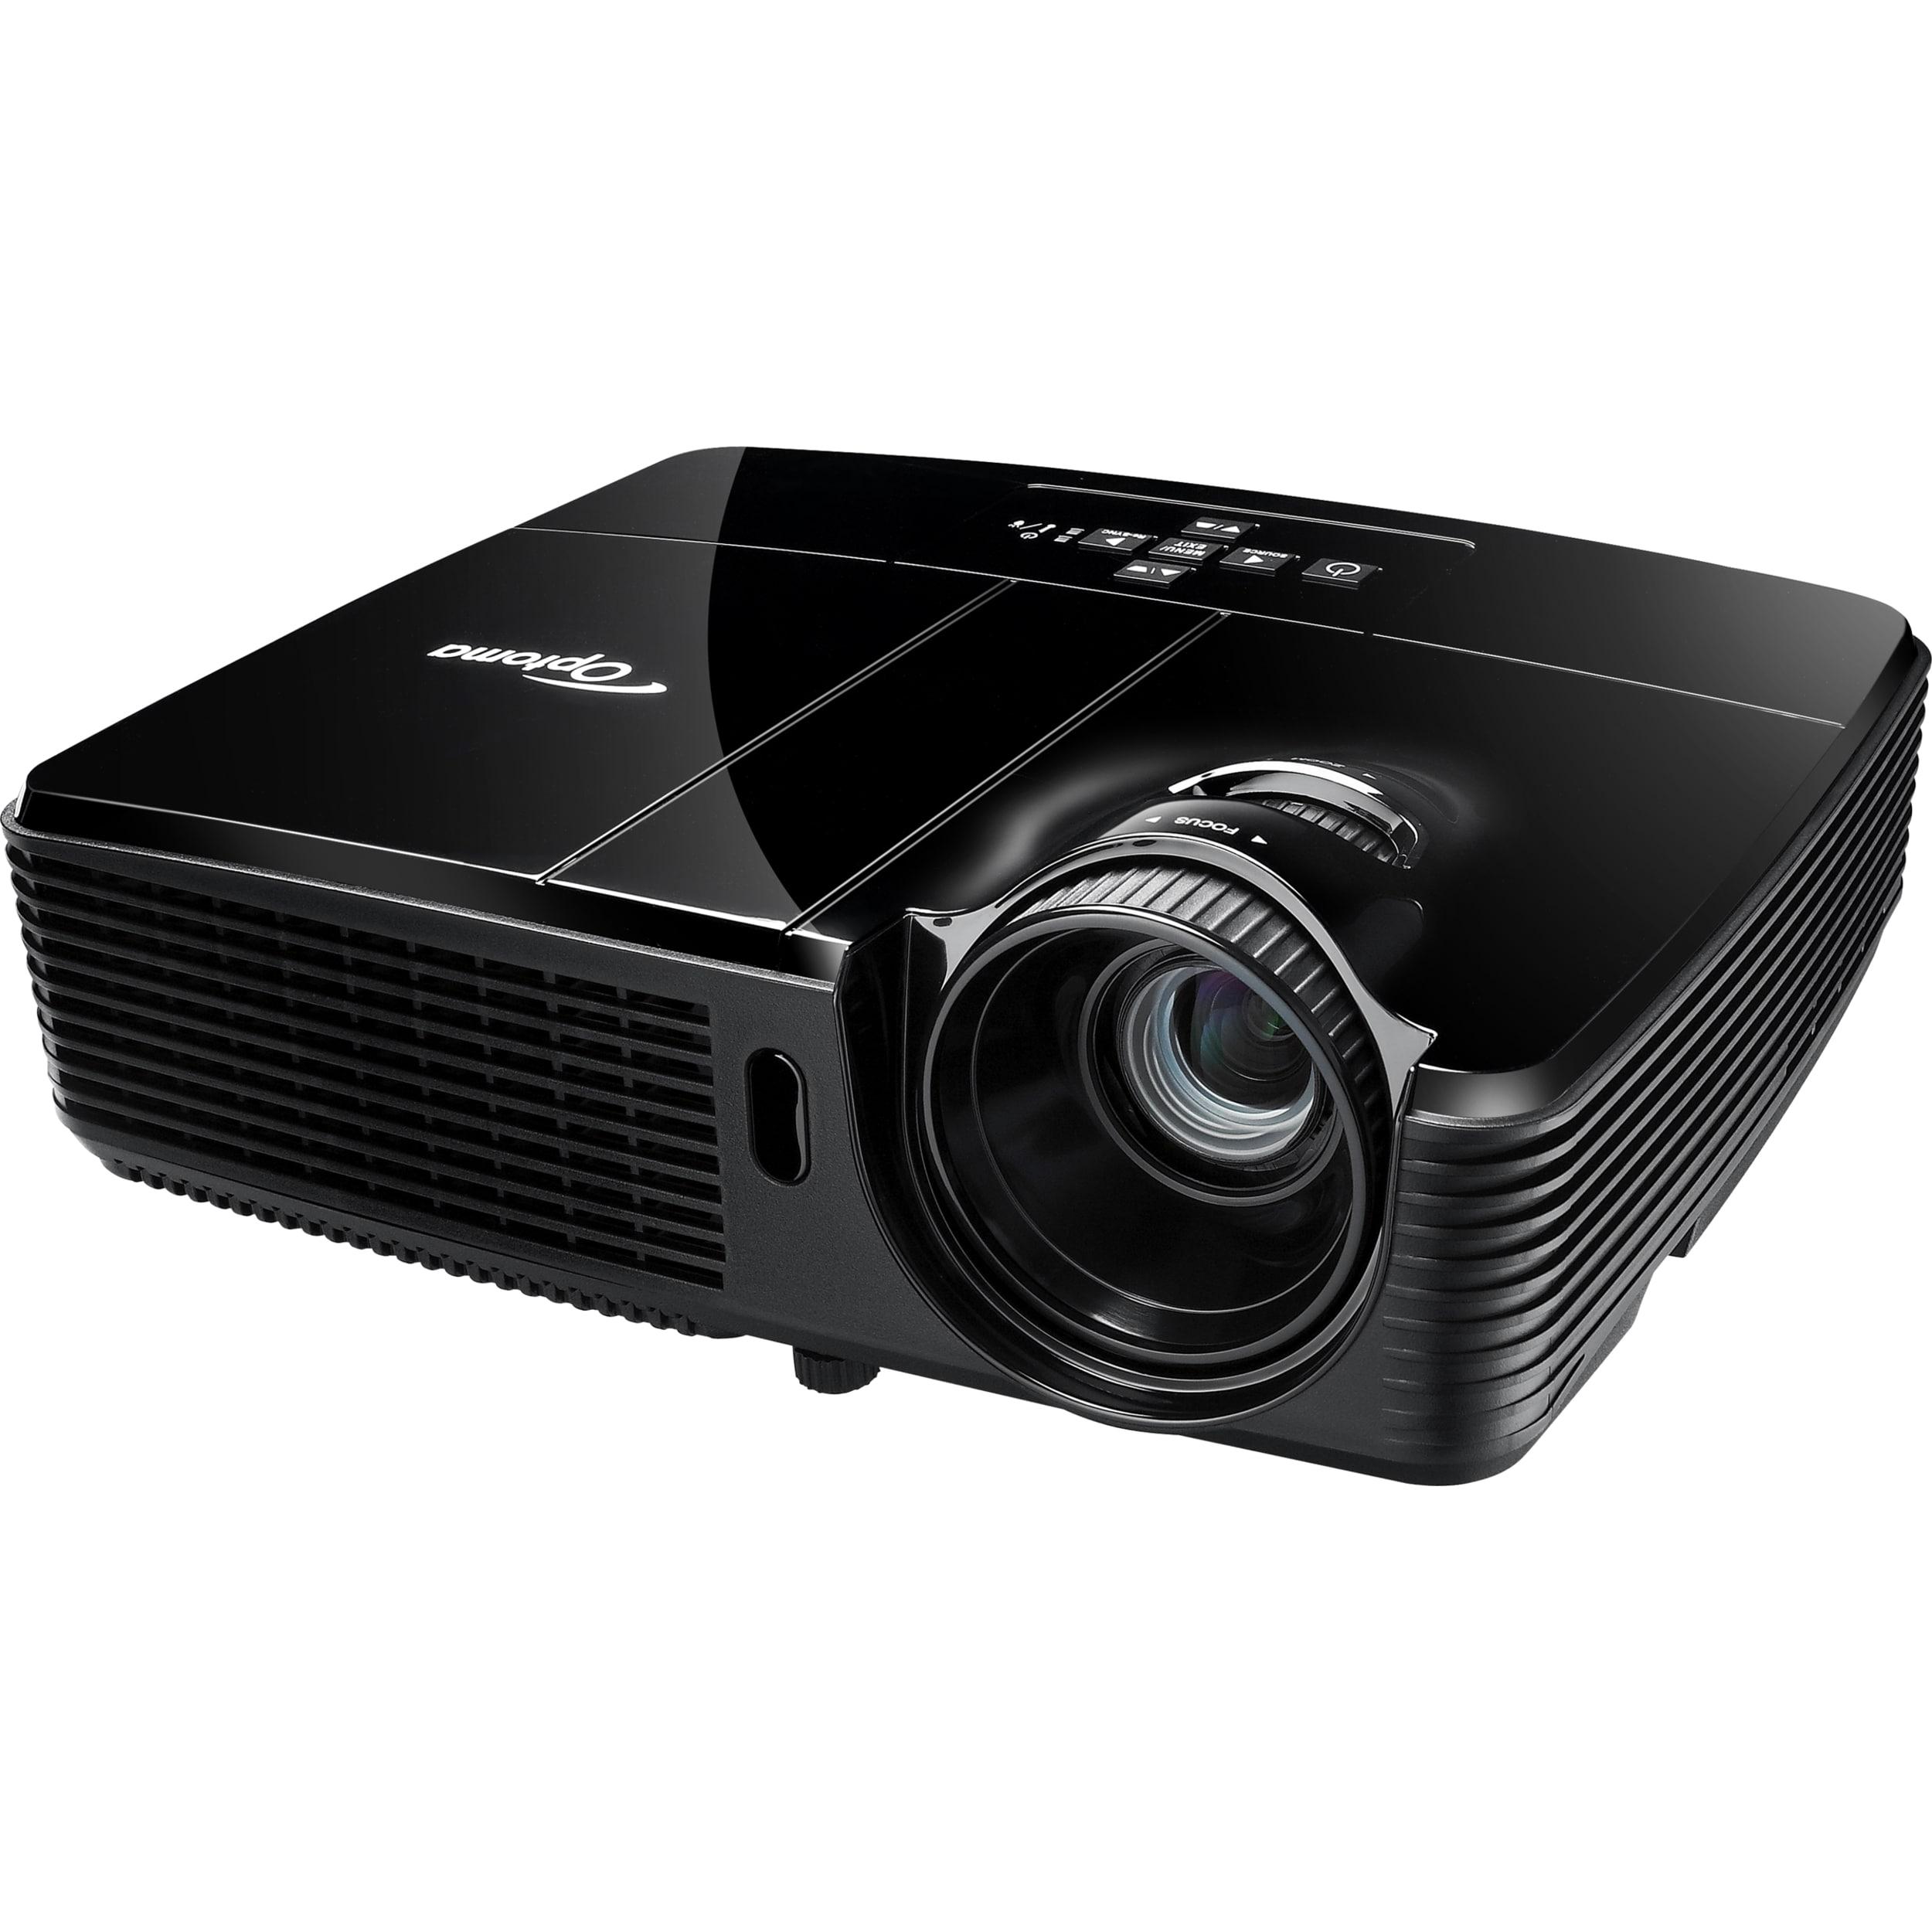 Optoma TS551 3D Ready DLP Projector - 720p - HDTV - 4:3